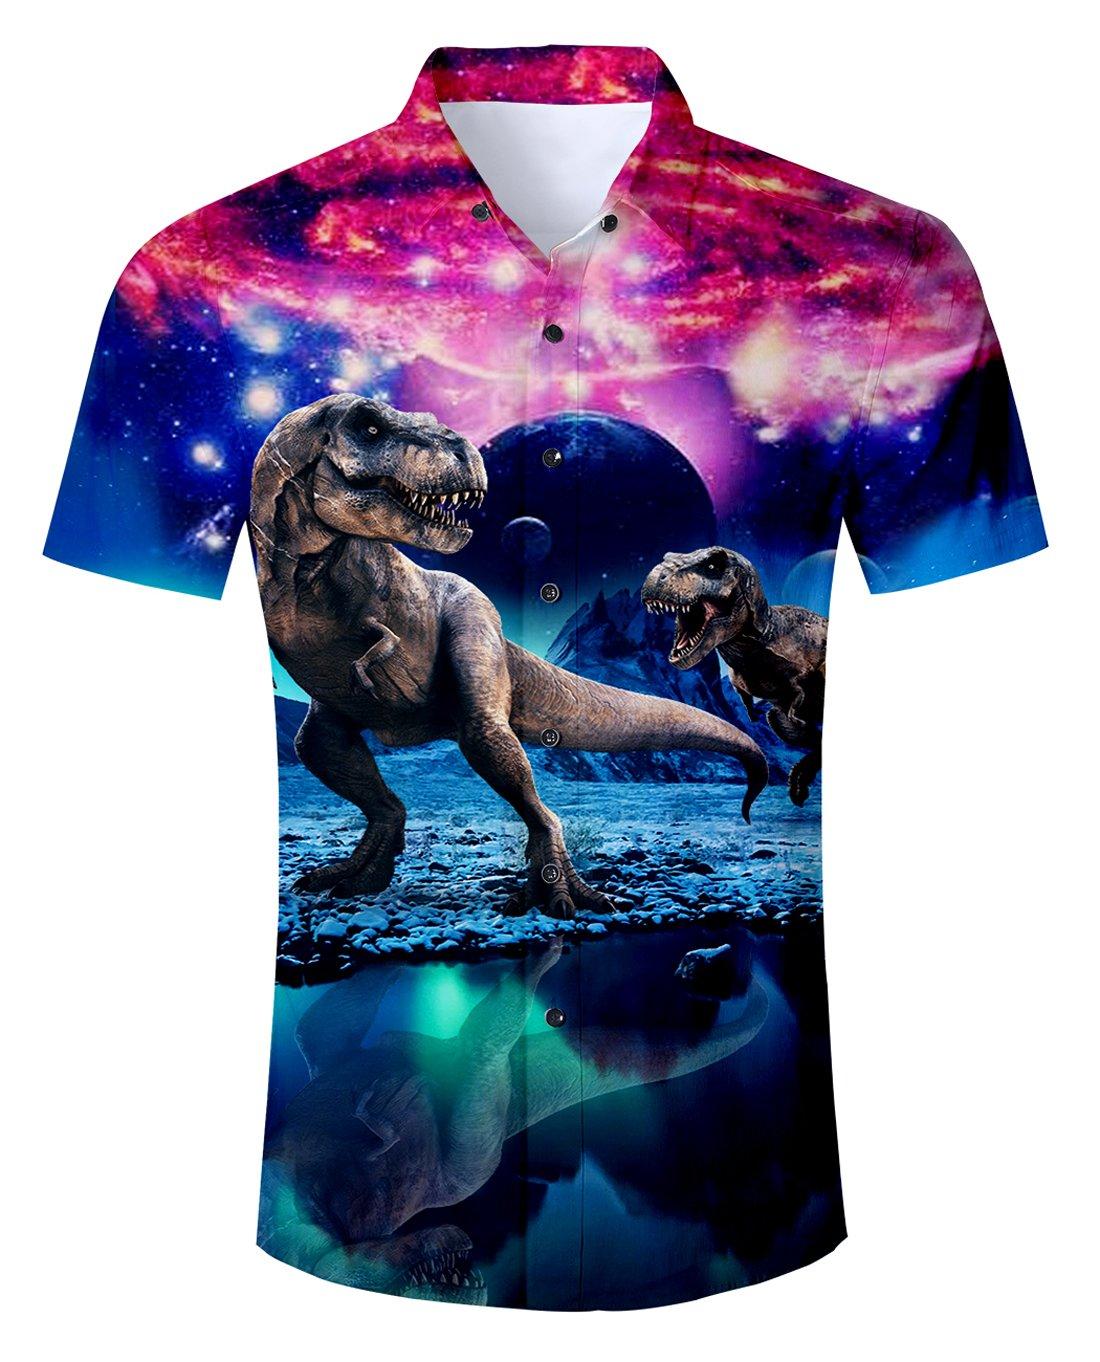 Uideazone Teen Boys 3D Printed Galaxy Dinosaur Short Sleeve Shirts Casual Tee Shirt by Uideazone